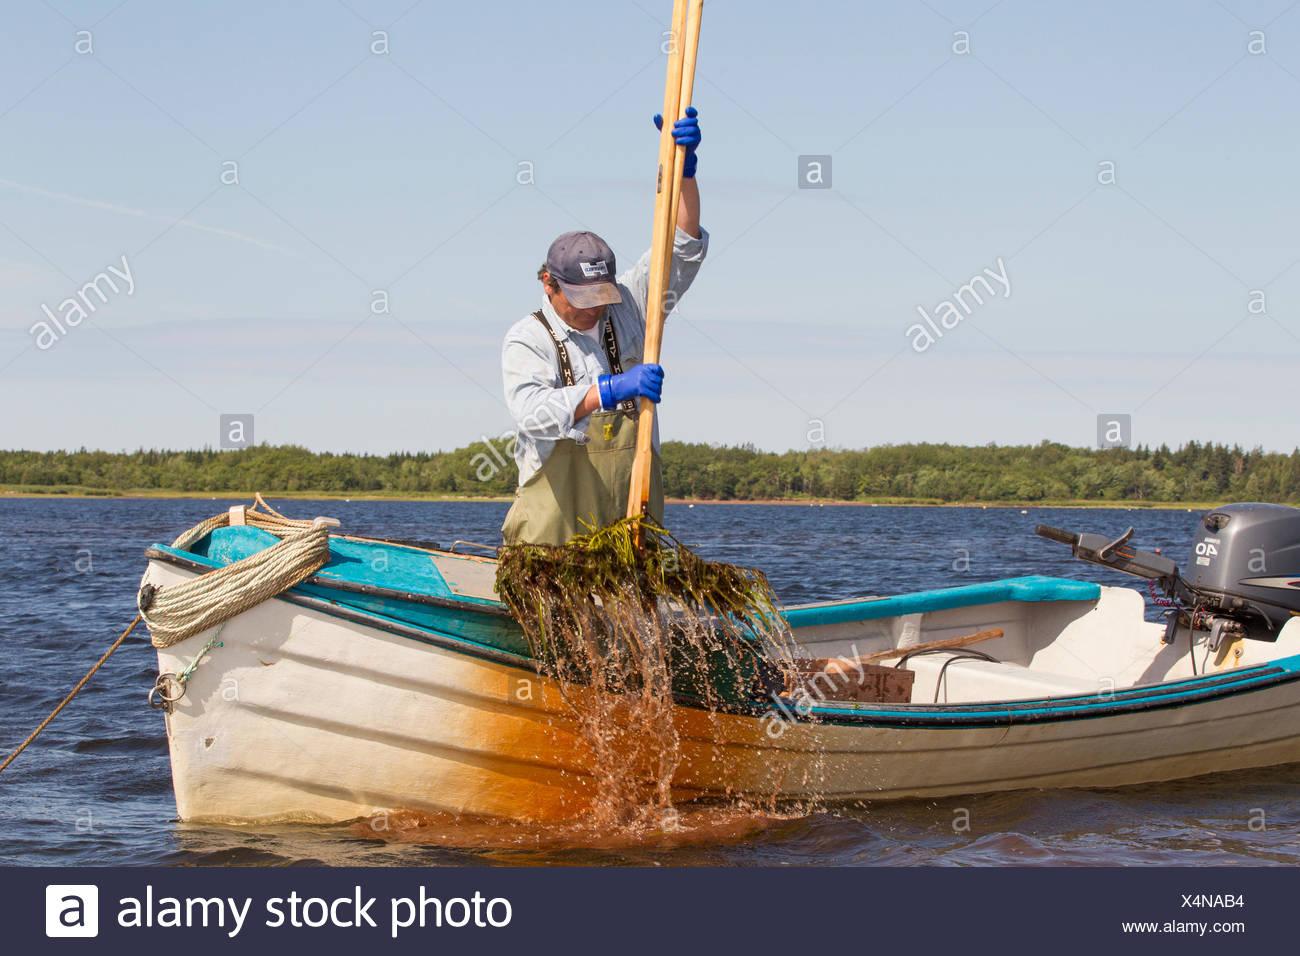 oyster Fisherman, West Prince, Prince Edward Island, Canada - Stock Image